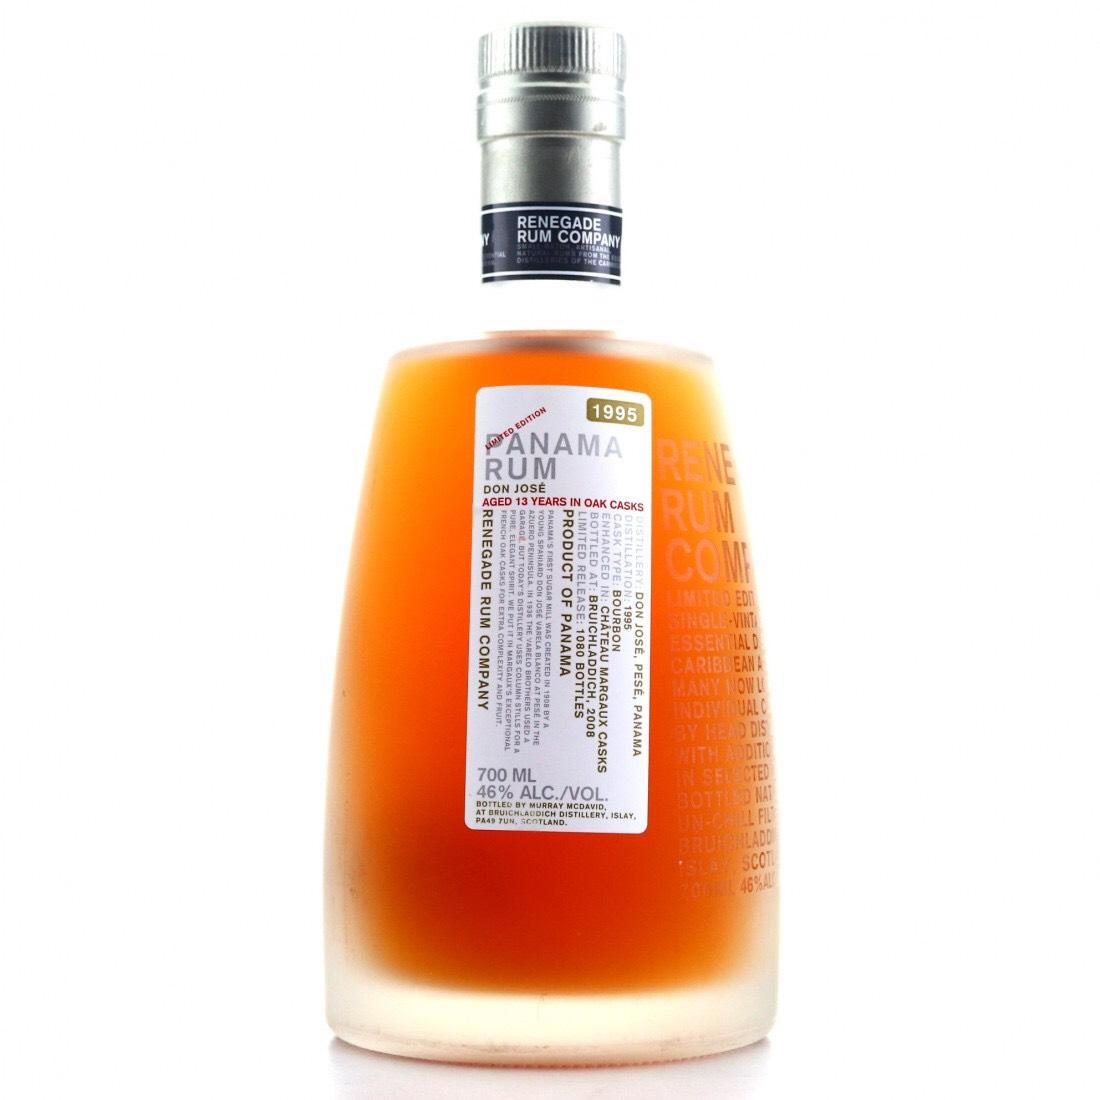 Bottle image of Panama Rum